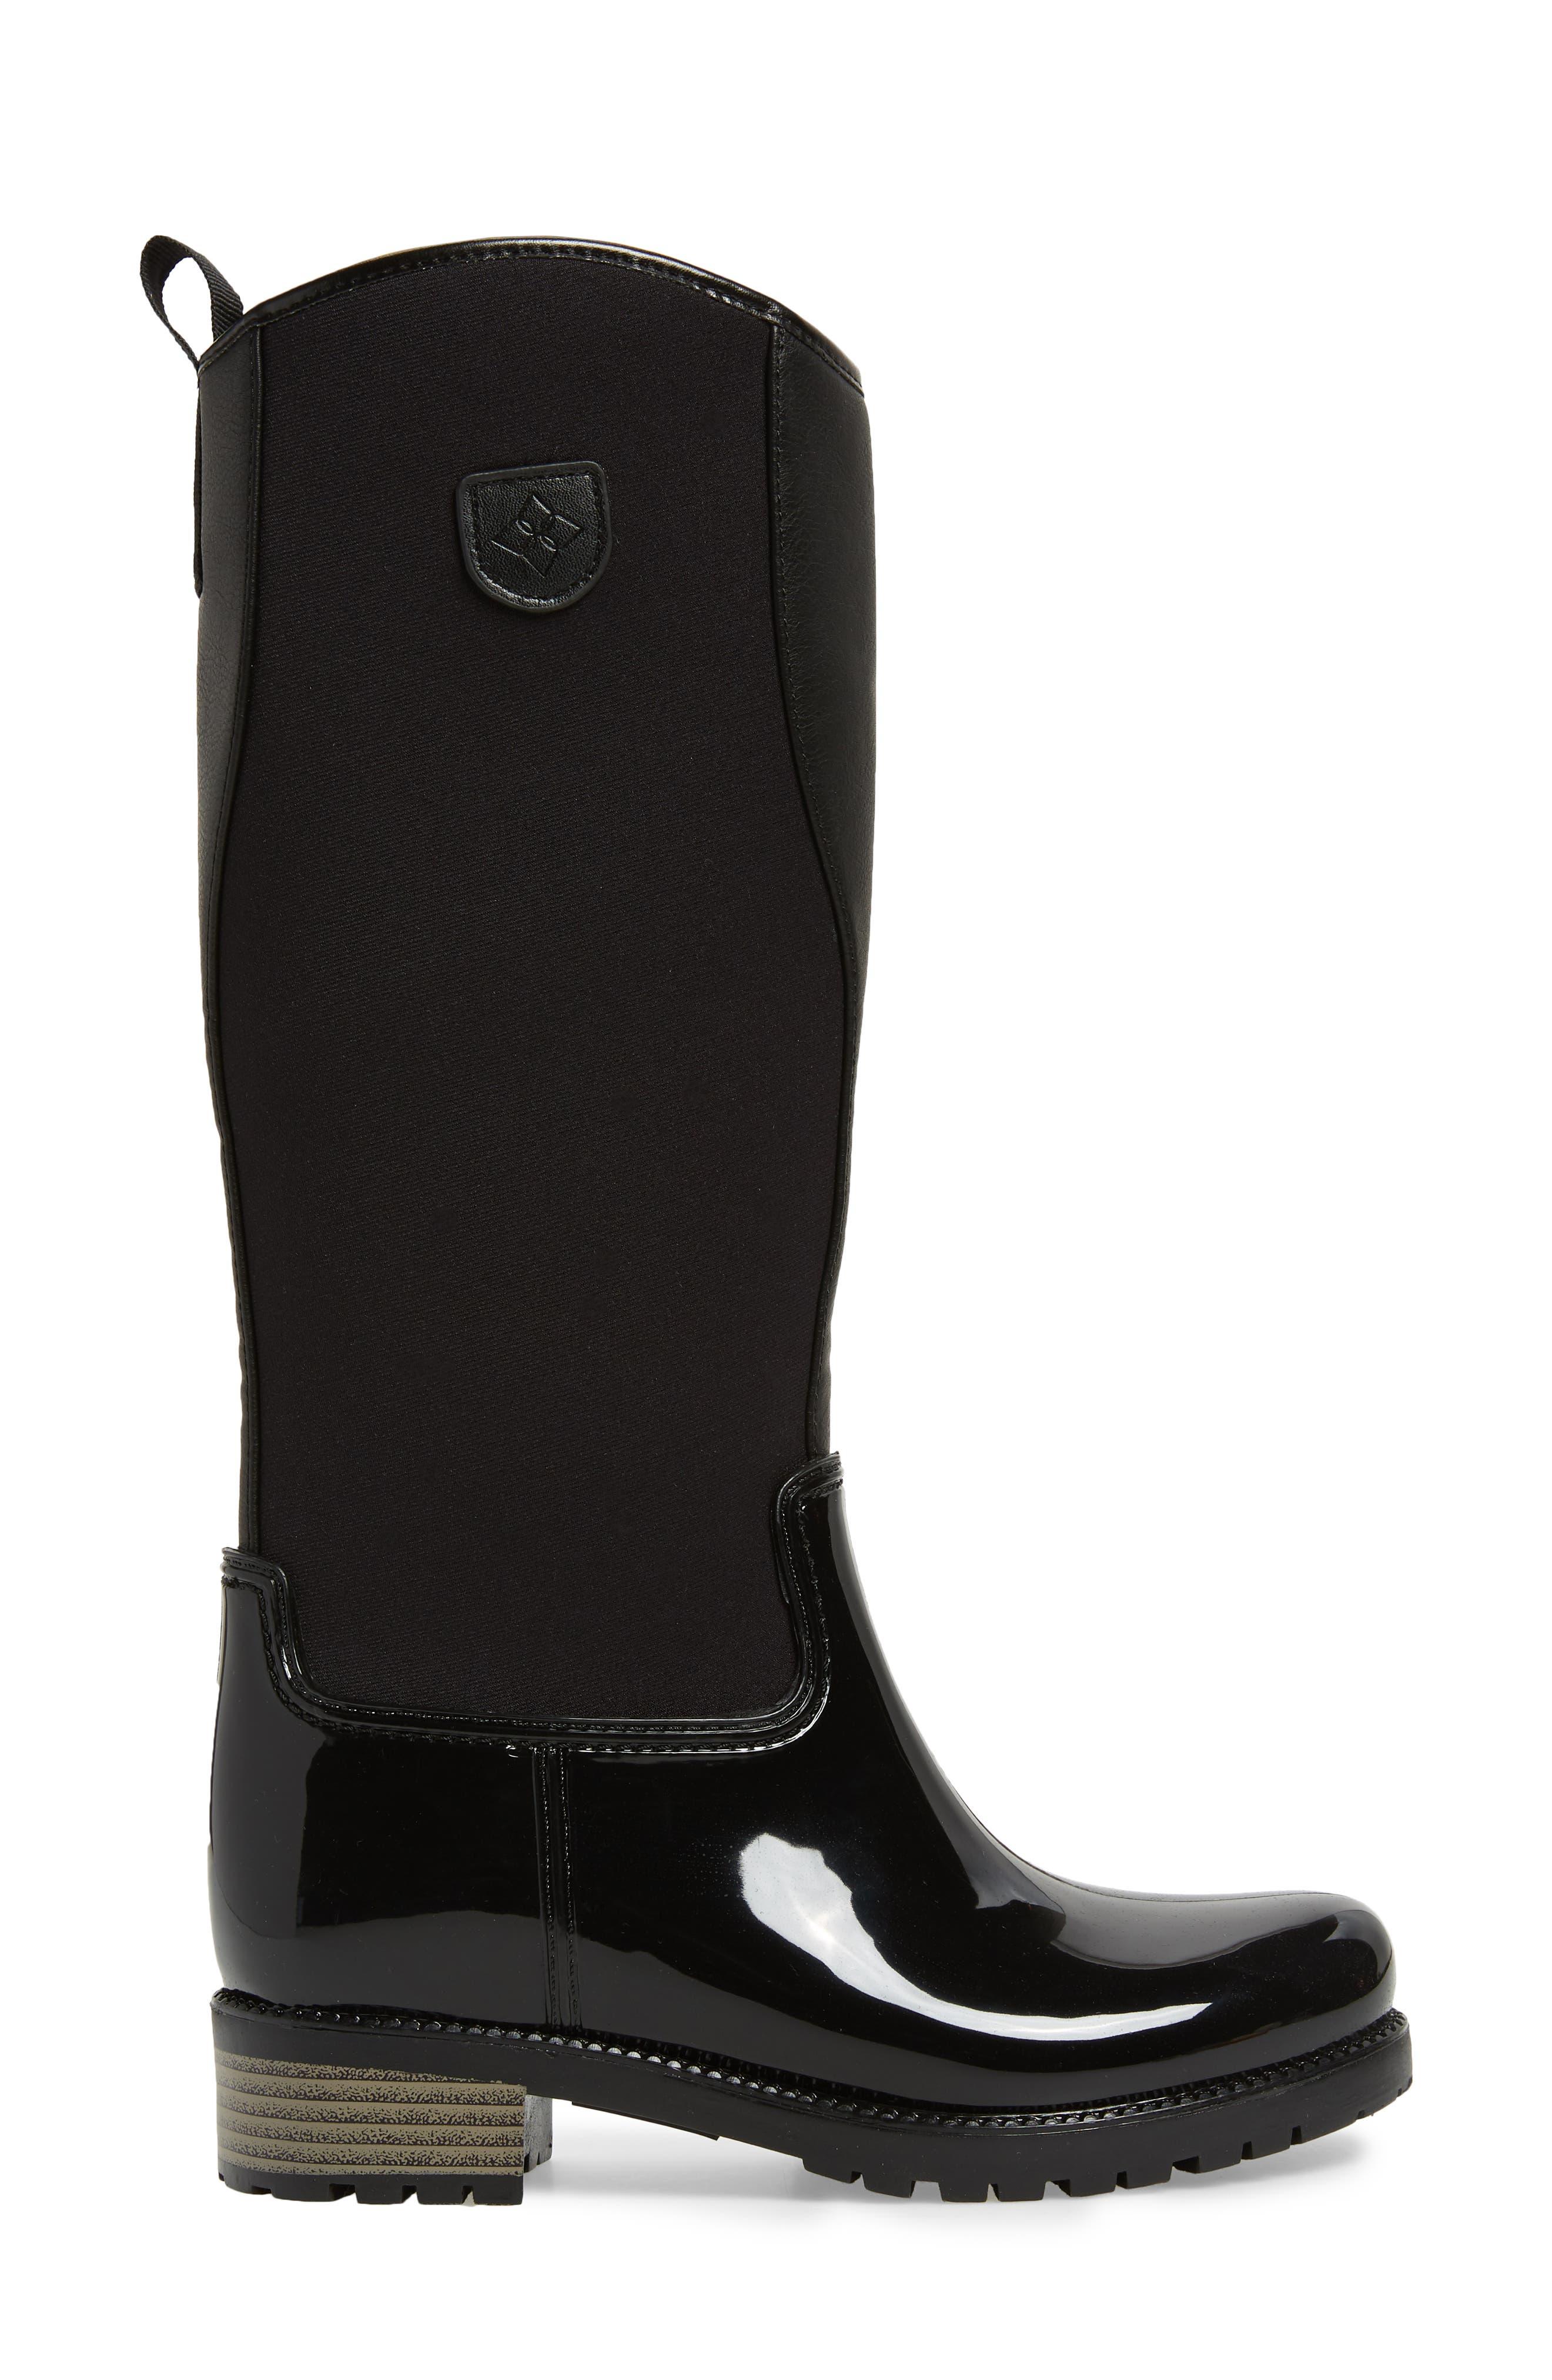 Parma 2 Tall Waterproof Rain Boot,                             Alternate thumbnail 3, color,                             BLACK FABRIC